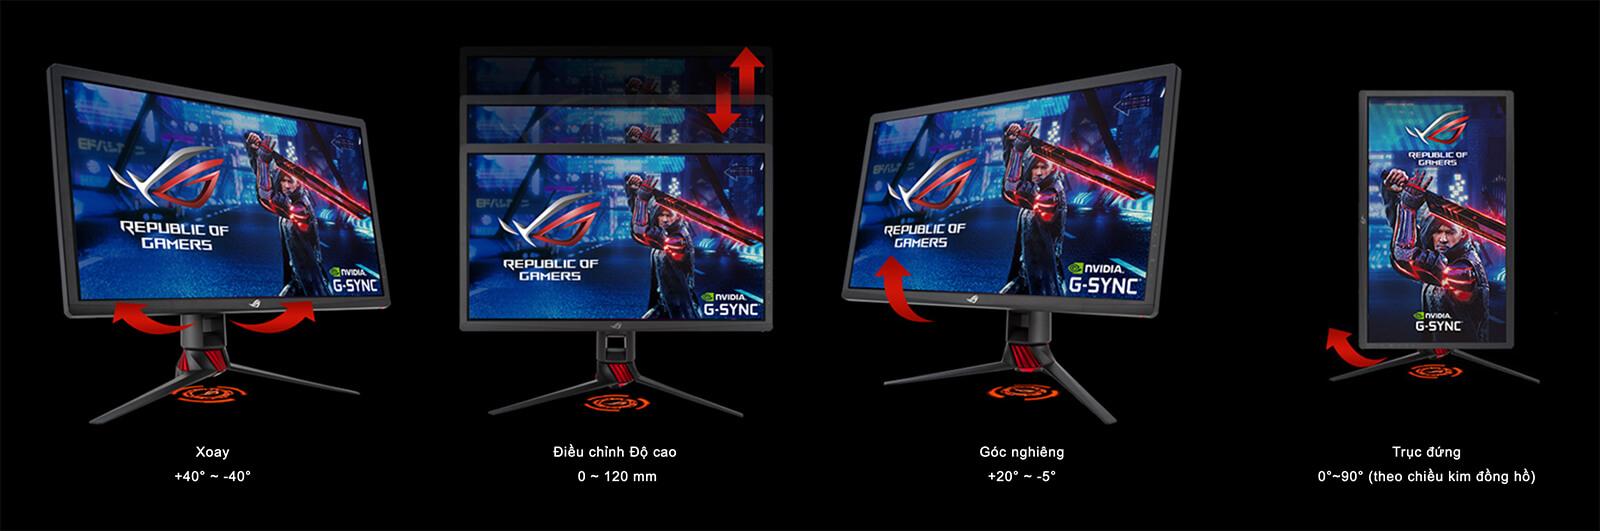 Asus Rog Strixxg27uq Gaming Monitor – Features 13